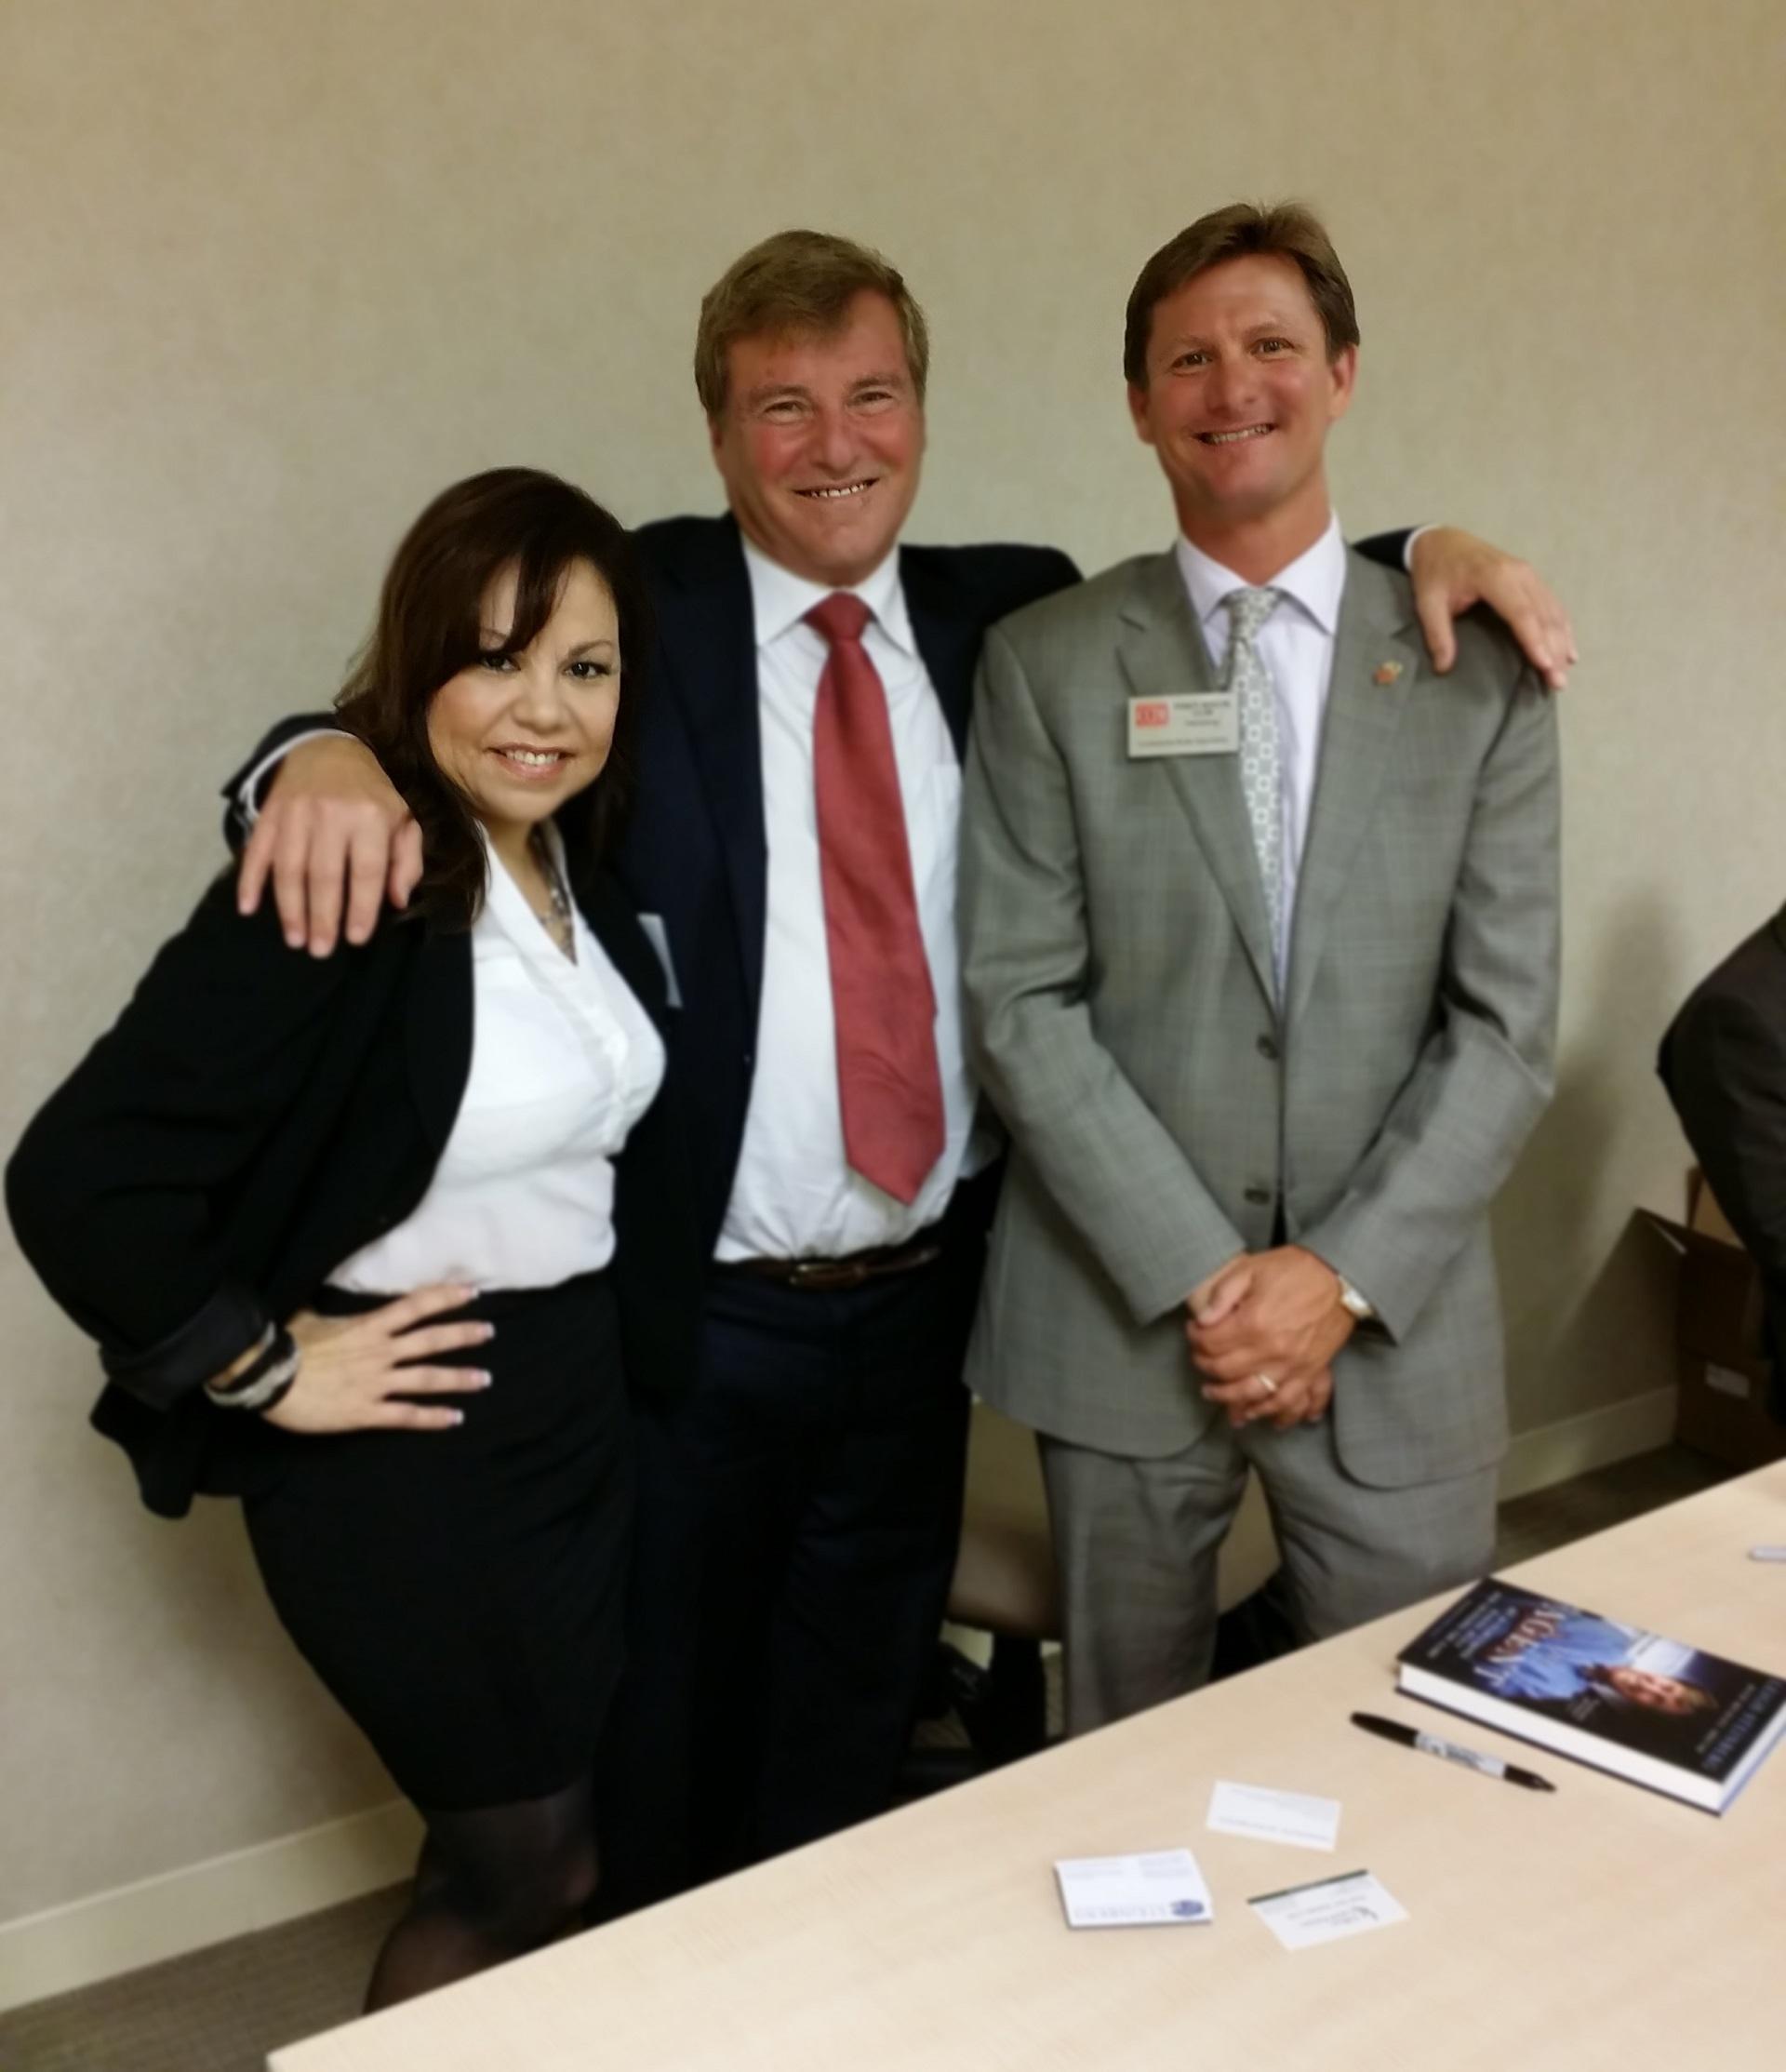 Randy Mason, Deborah Pierson, and Leigh Steinberg